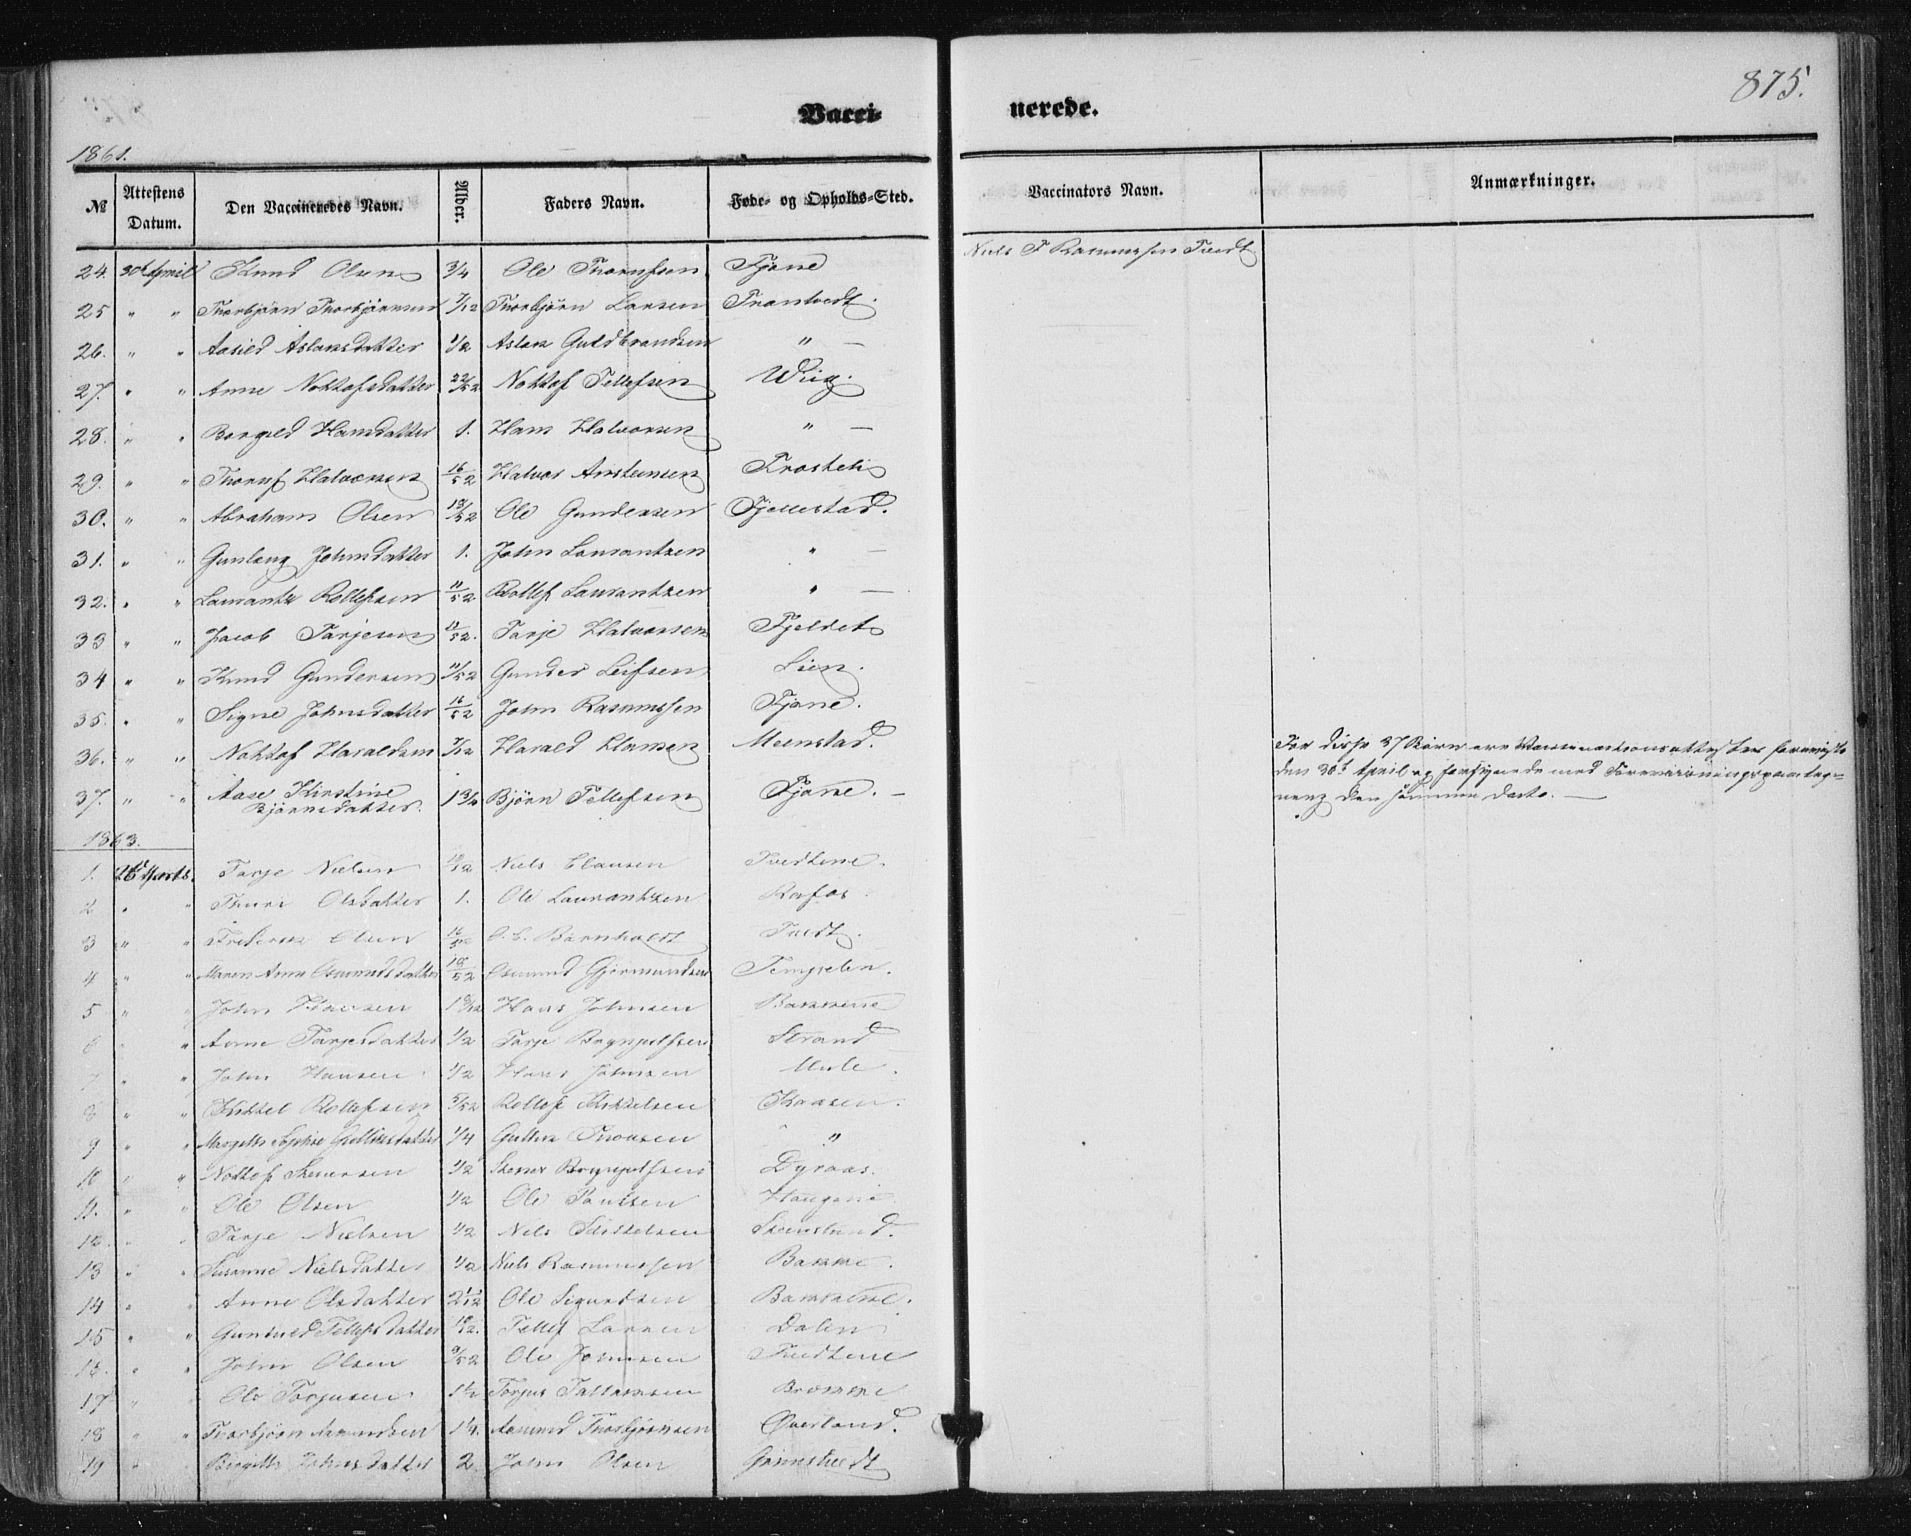 SAKO, Nissedal kirkebøker, F/Fa/L0003: Ministerialbok nr. I 3, 1846-1870, s. 874-875